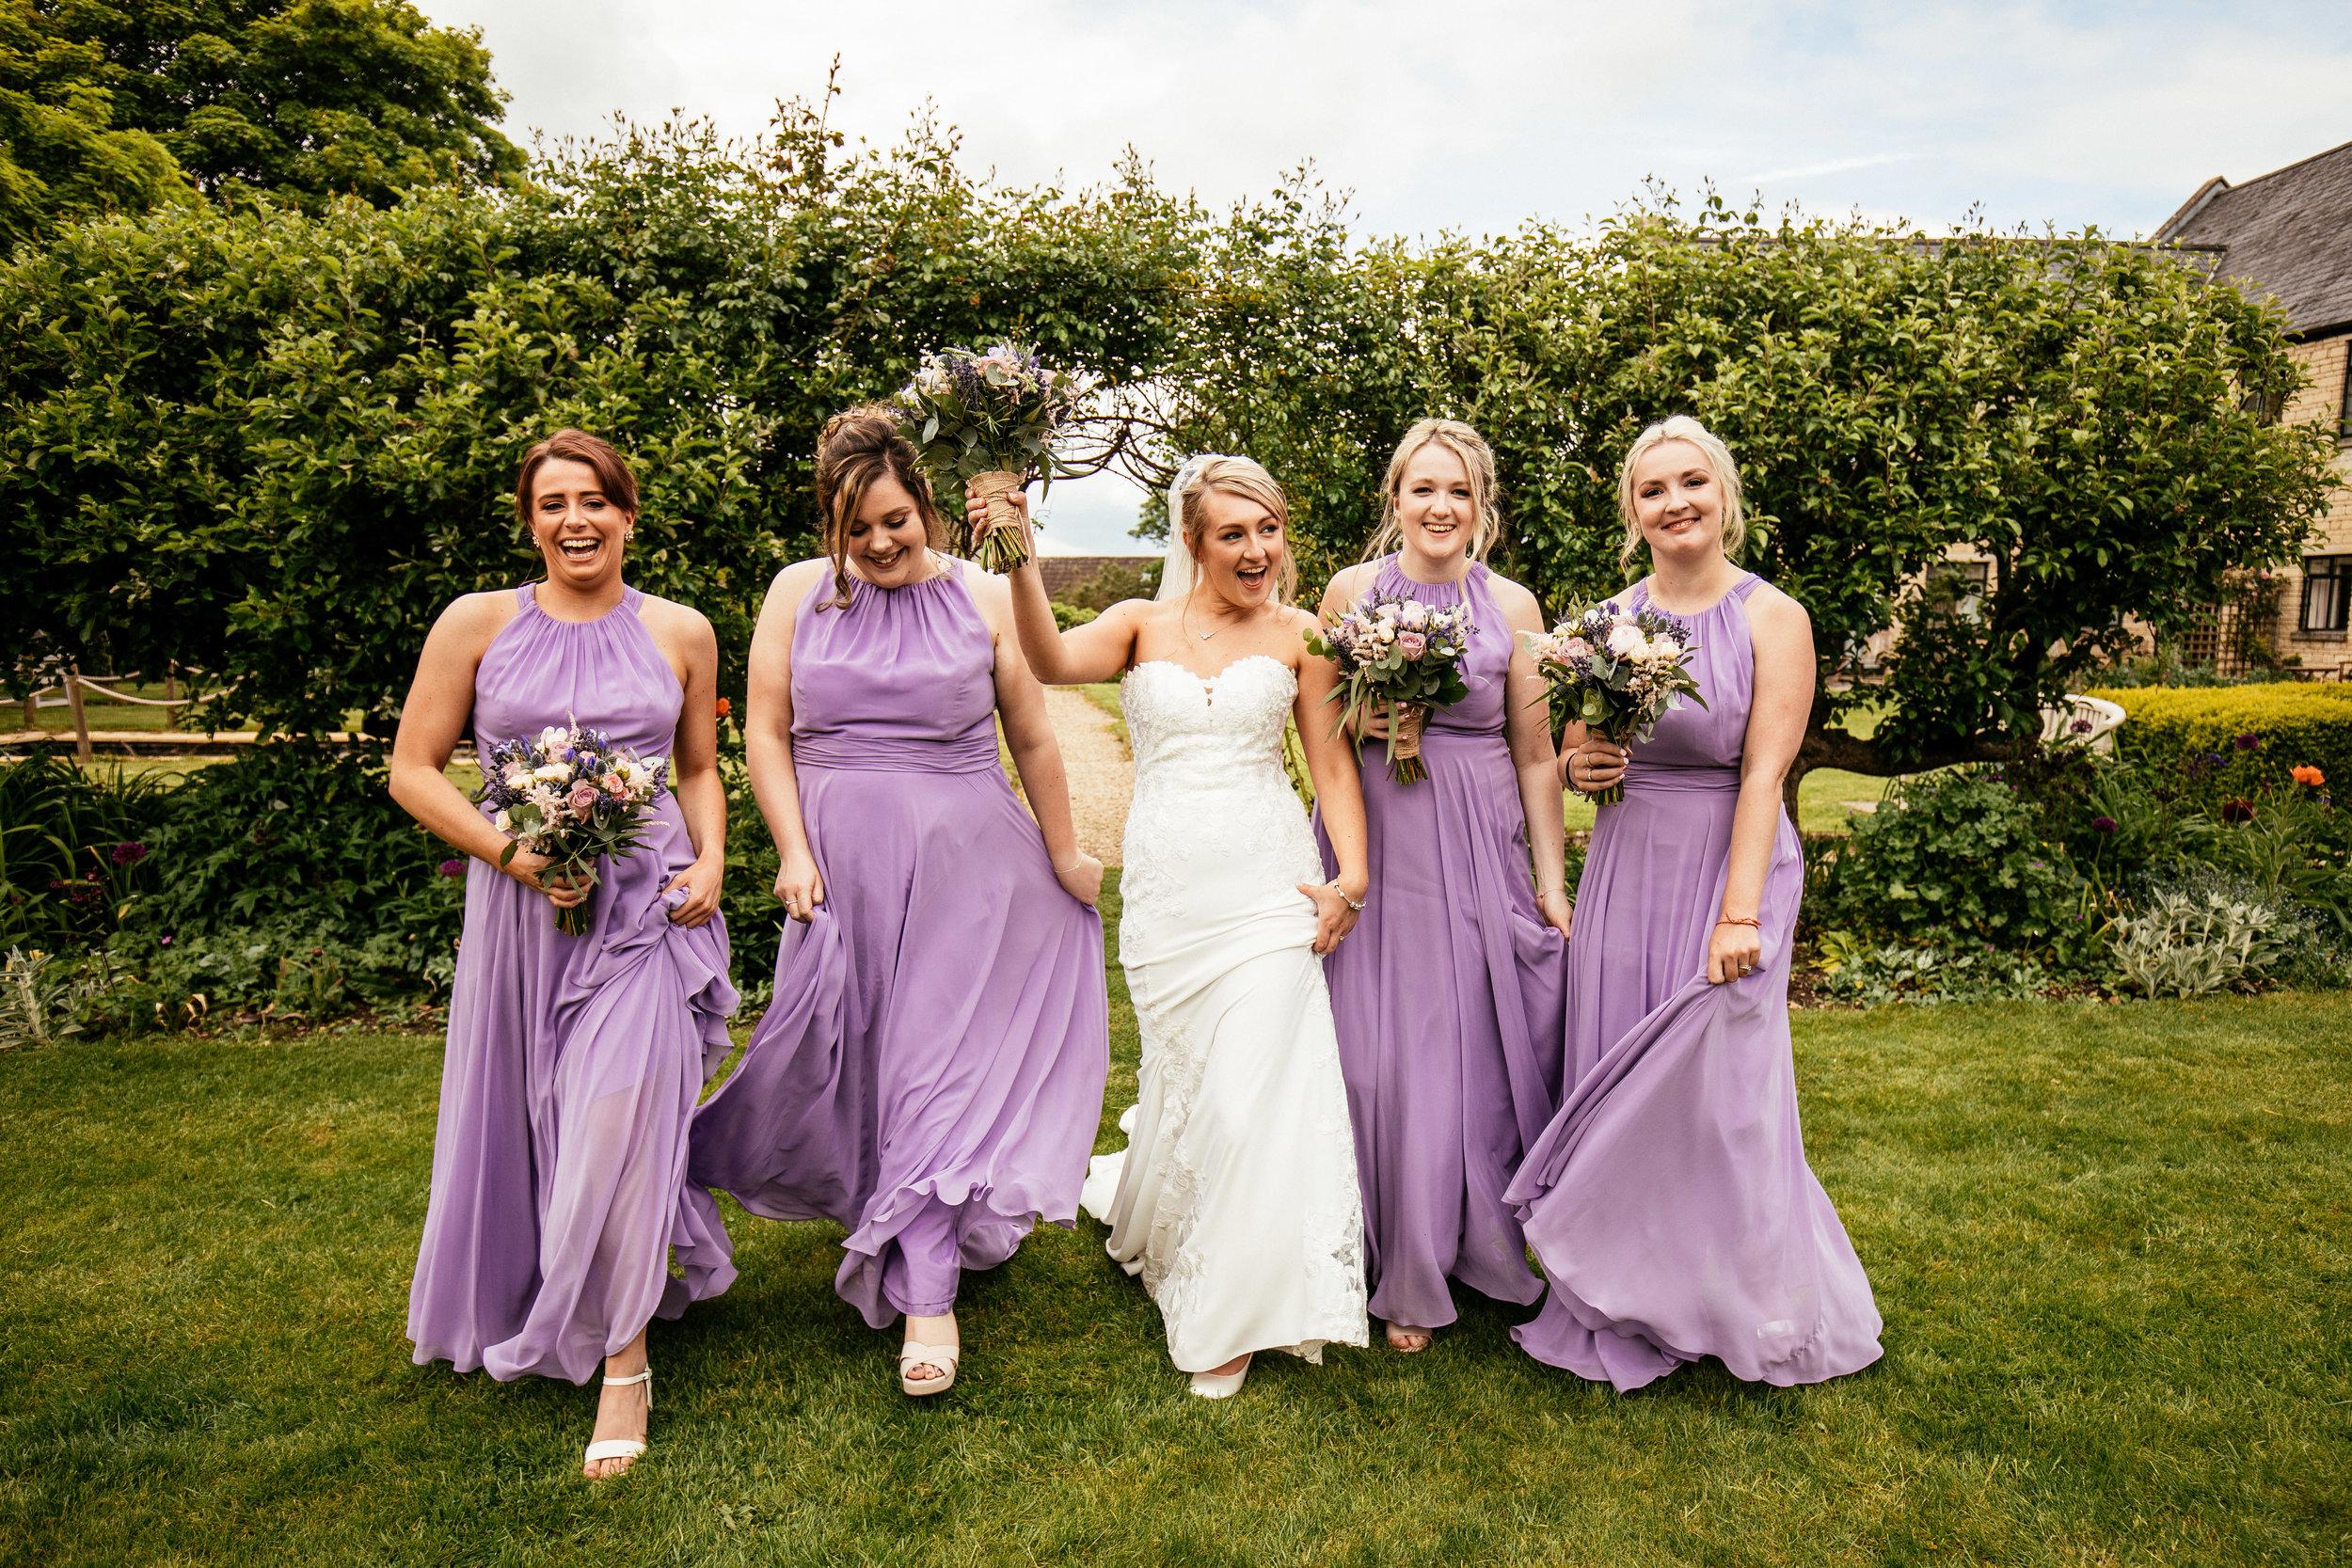 Becky-and-Sam-Wedding-Highlights-39.jpg